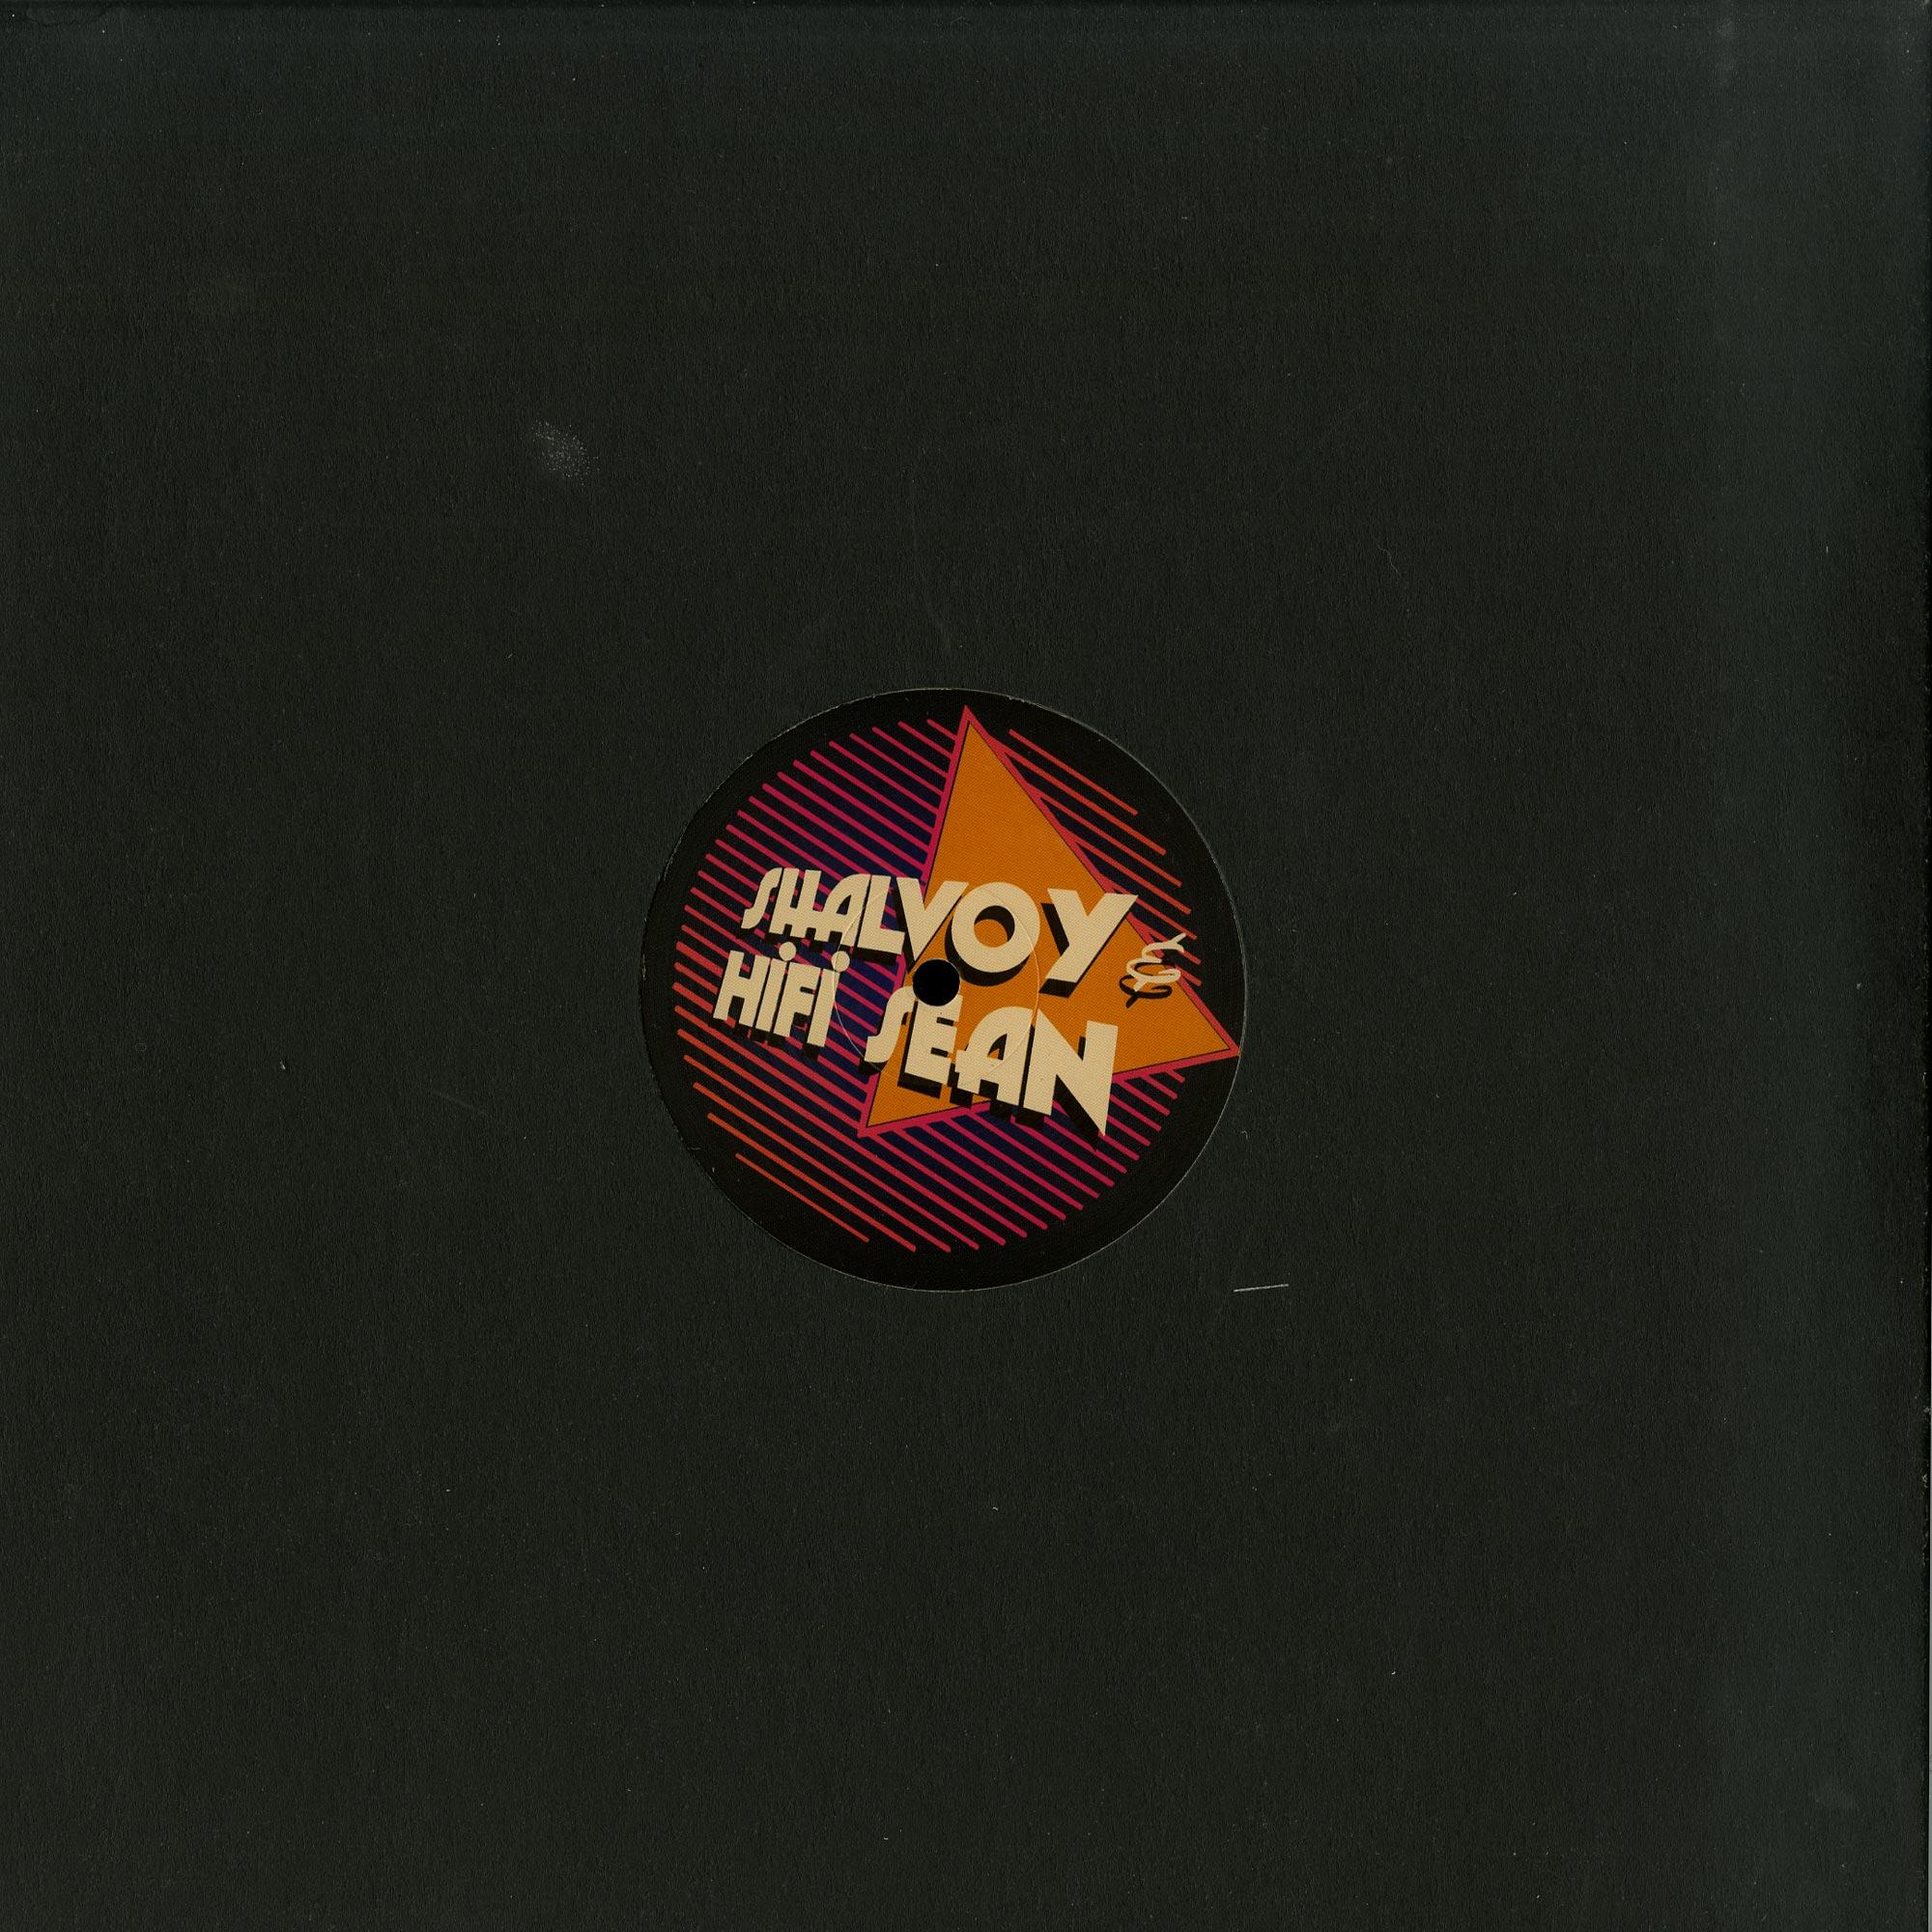 Hifi Sean & Shalvoy - Slipped Discs – Volume 2